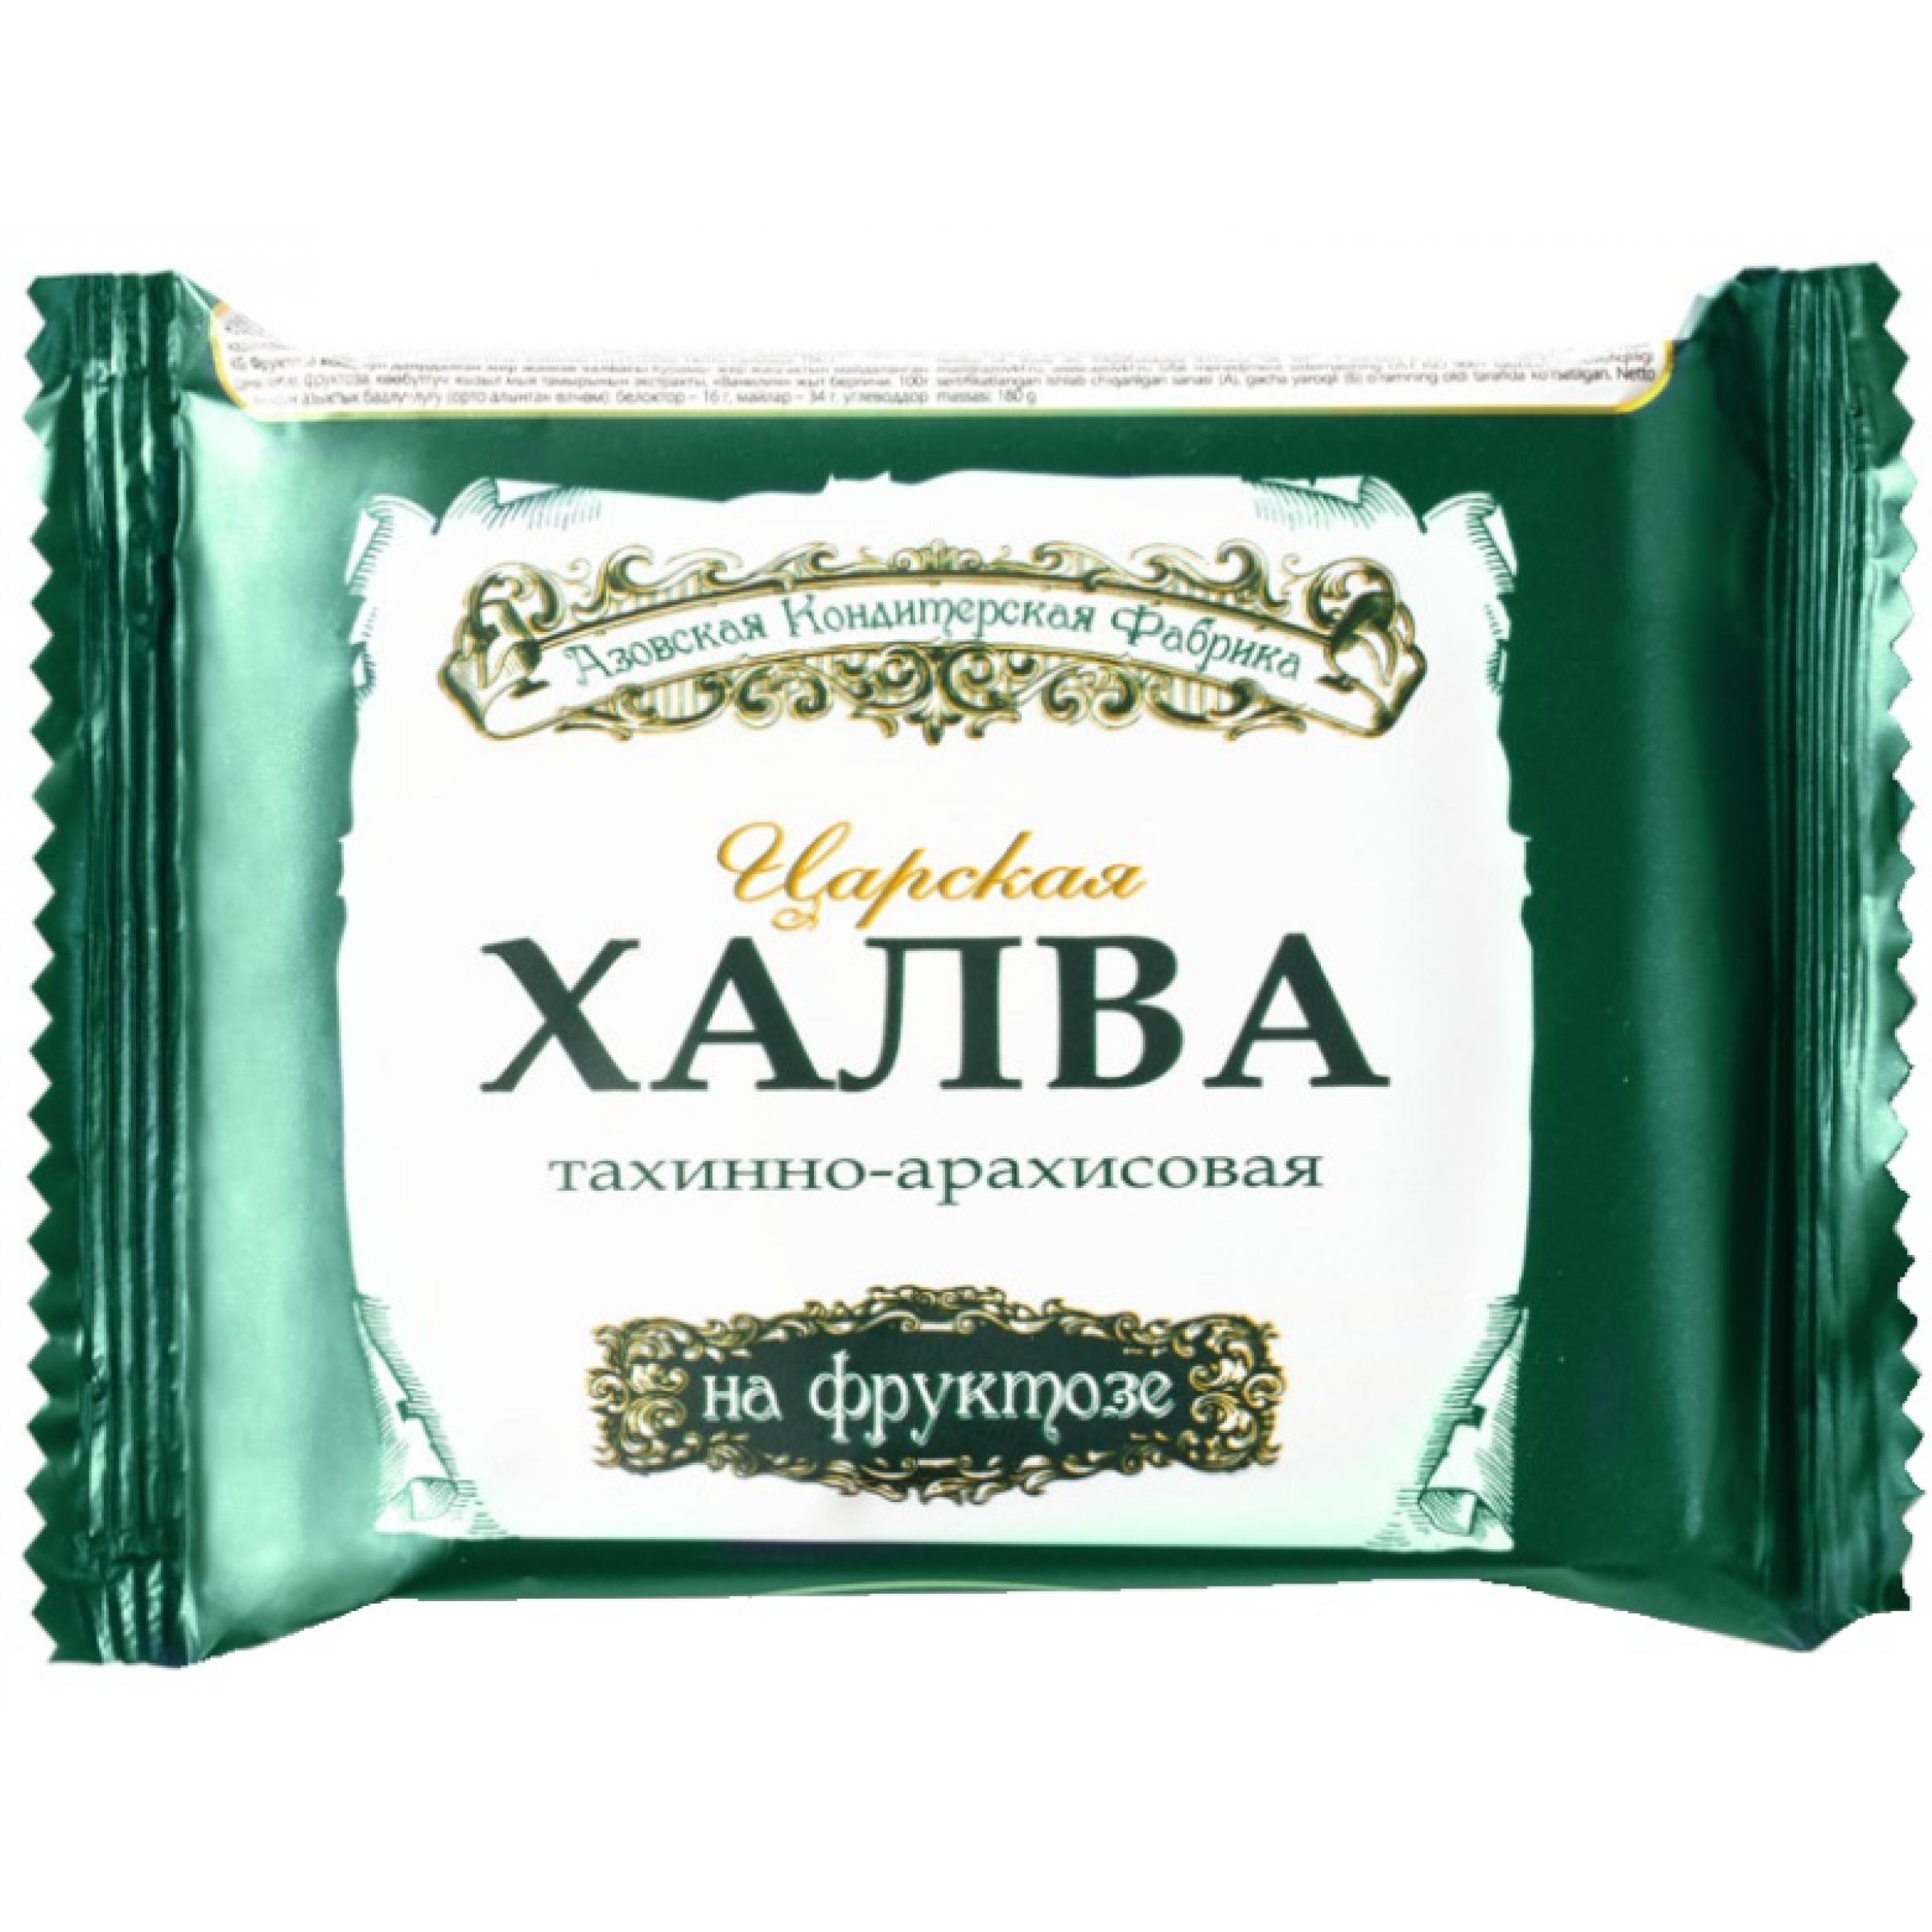 Халва тахинно-арахисовая на фруктозе, Азовская кондитерская фабрика, 180 гр